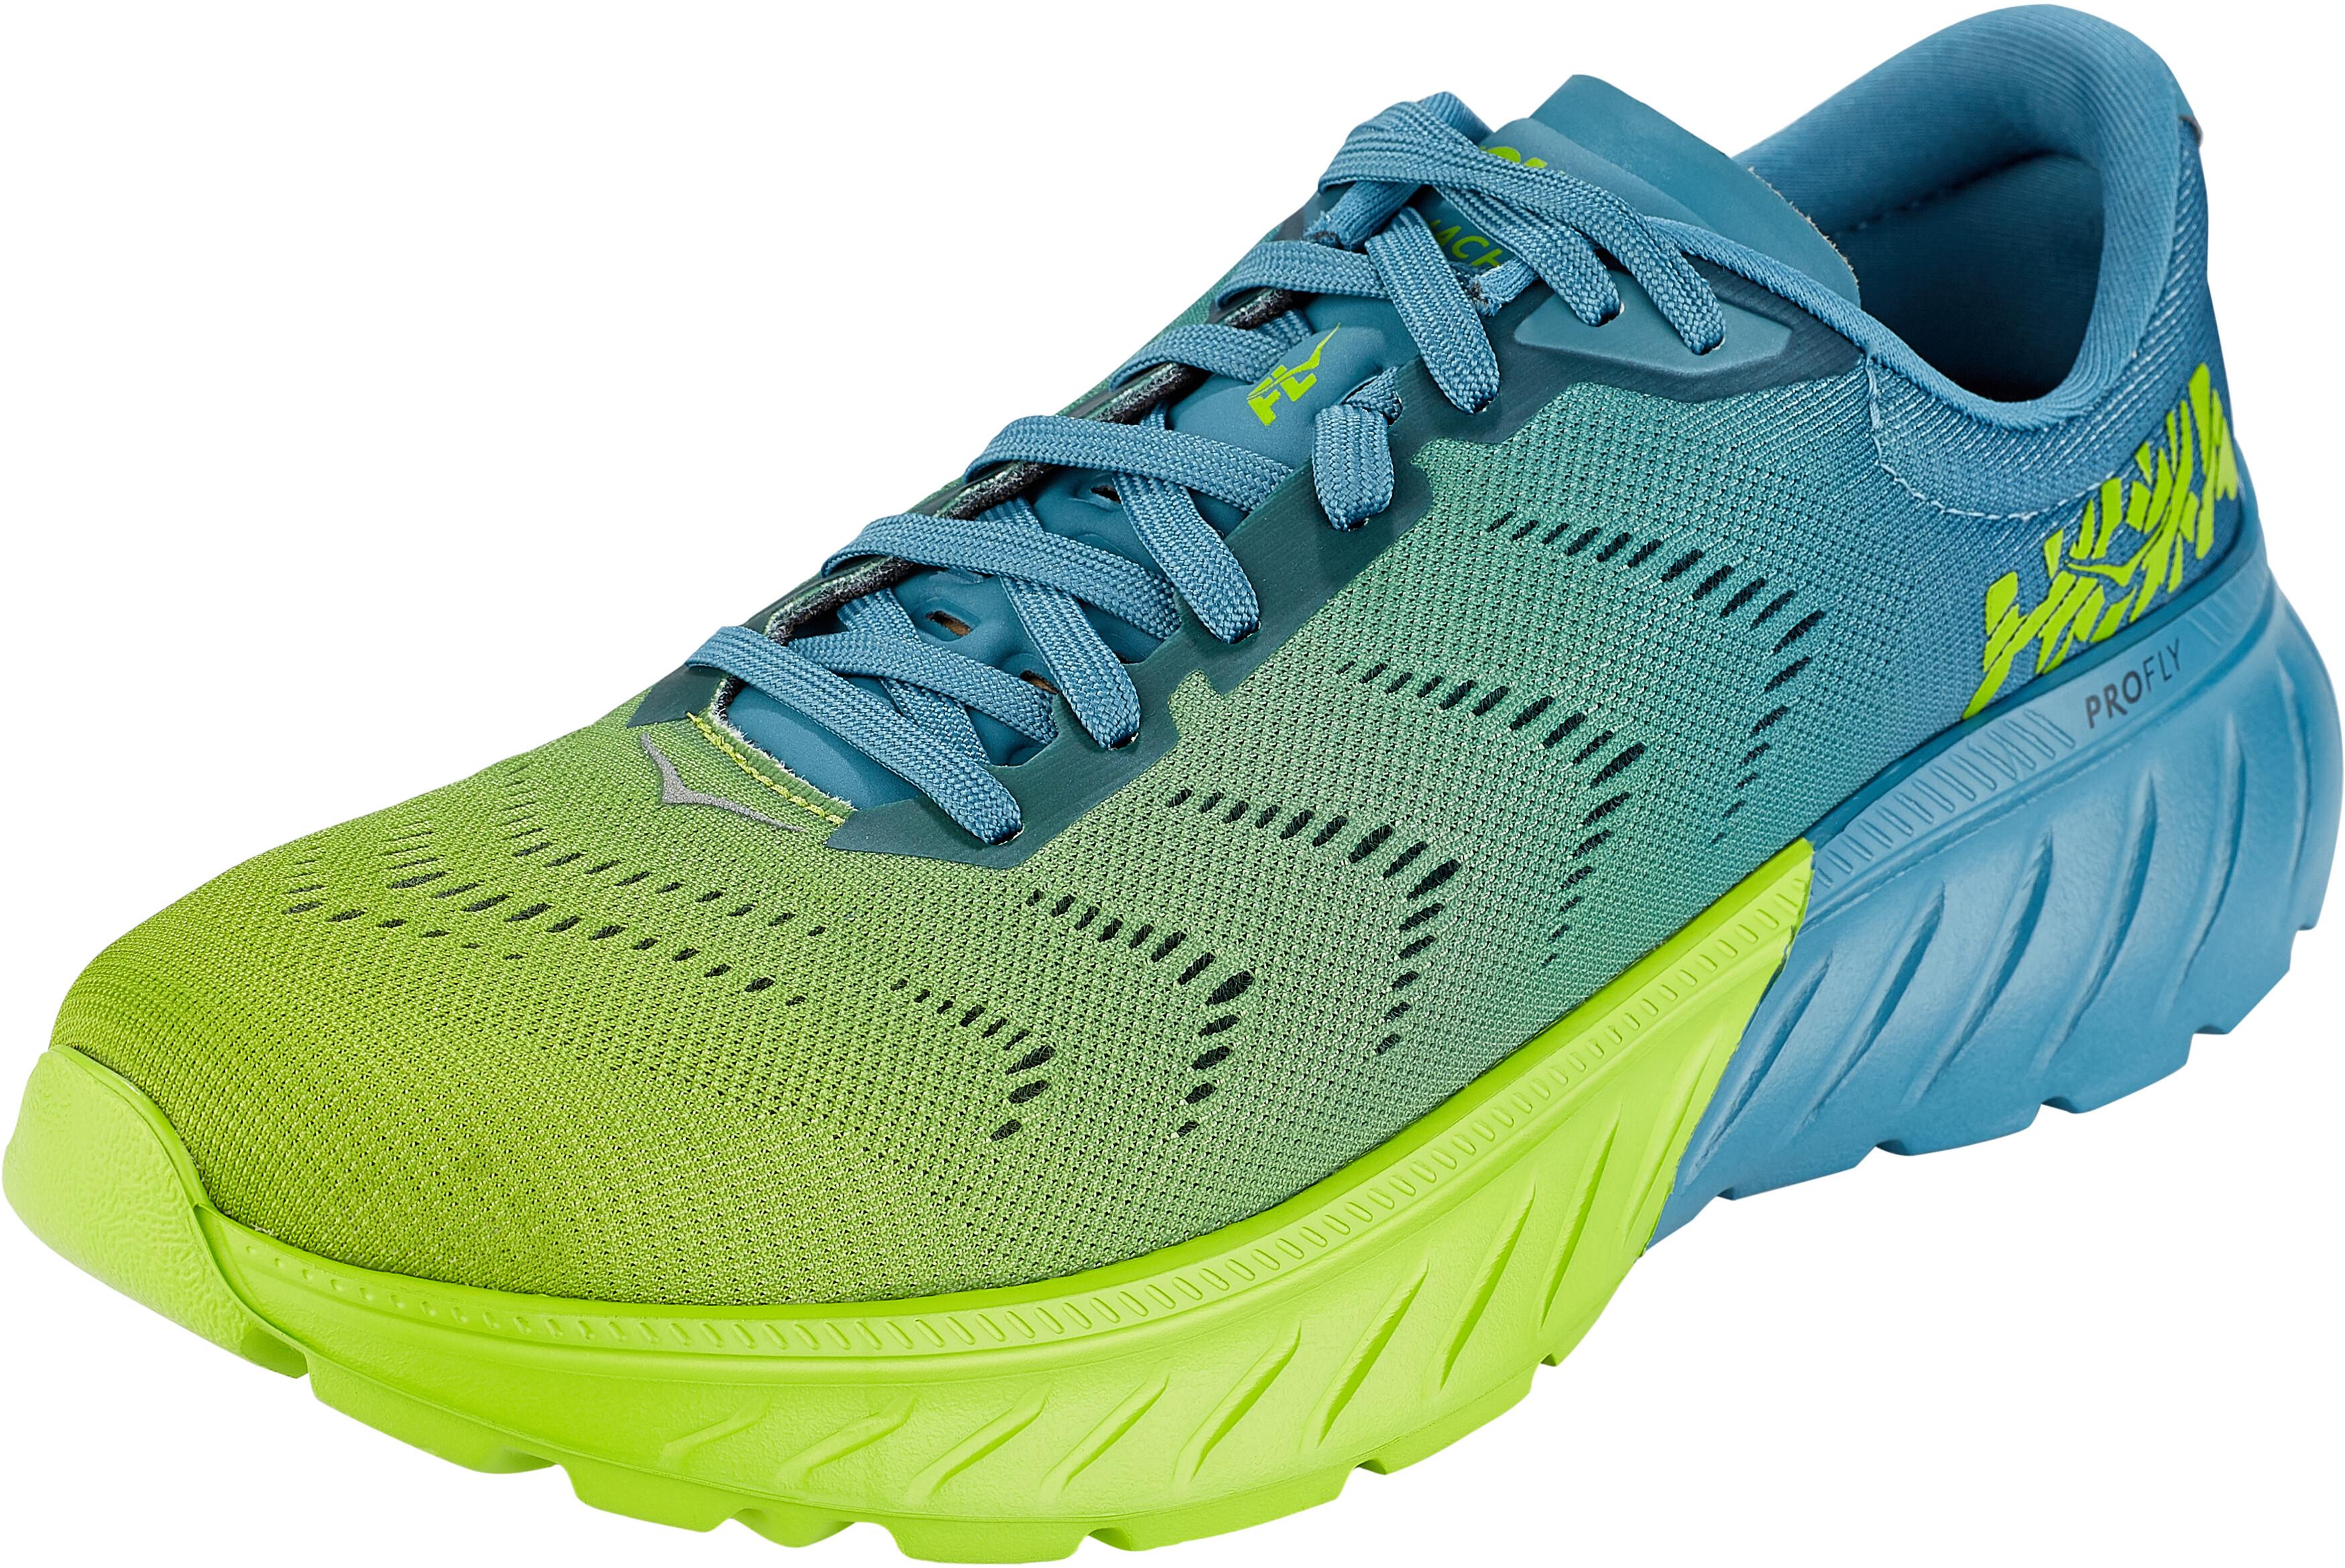 more photos a27bd 56bd6 Hoka One One Mach 2 Running Shoes Men storm blue/lime green